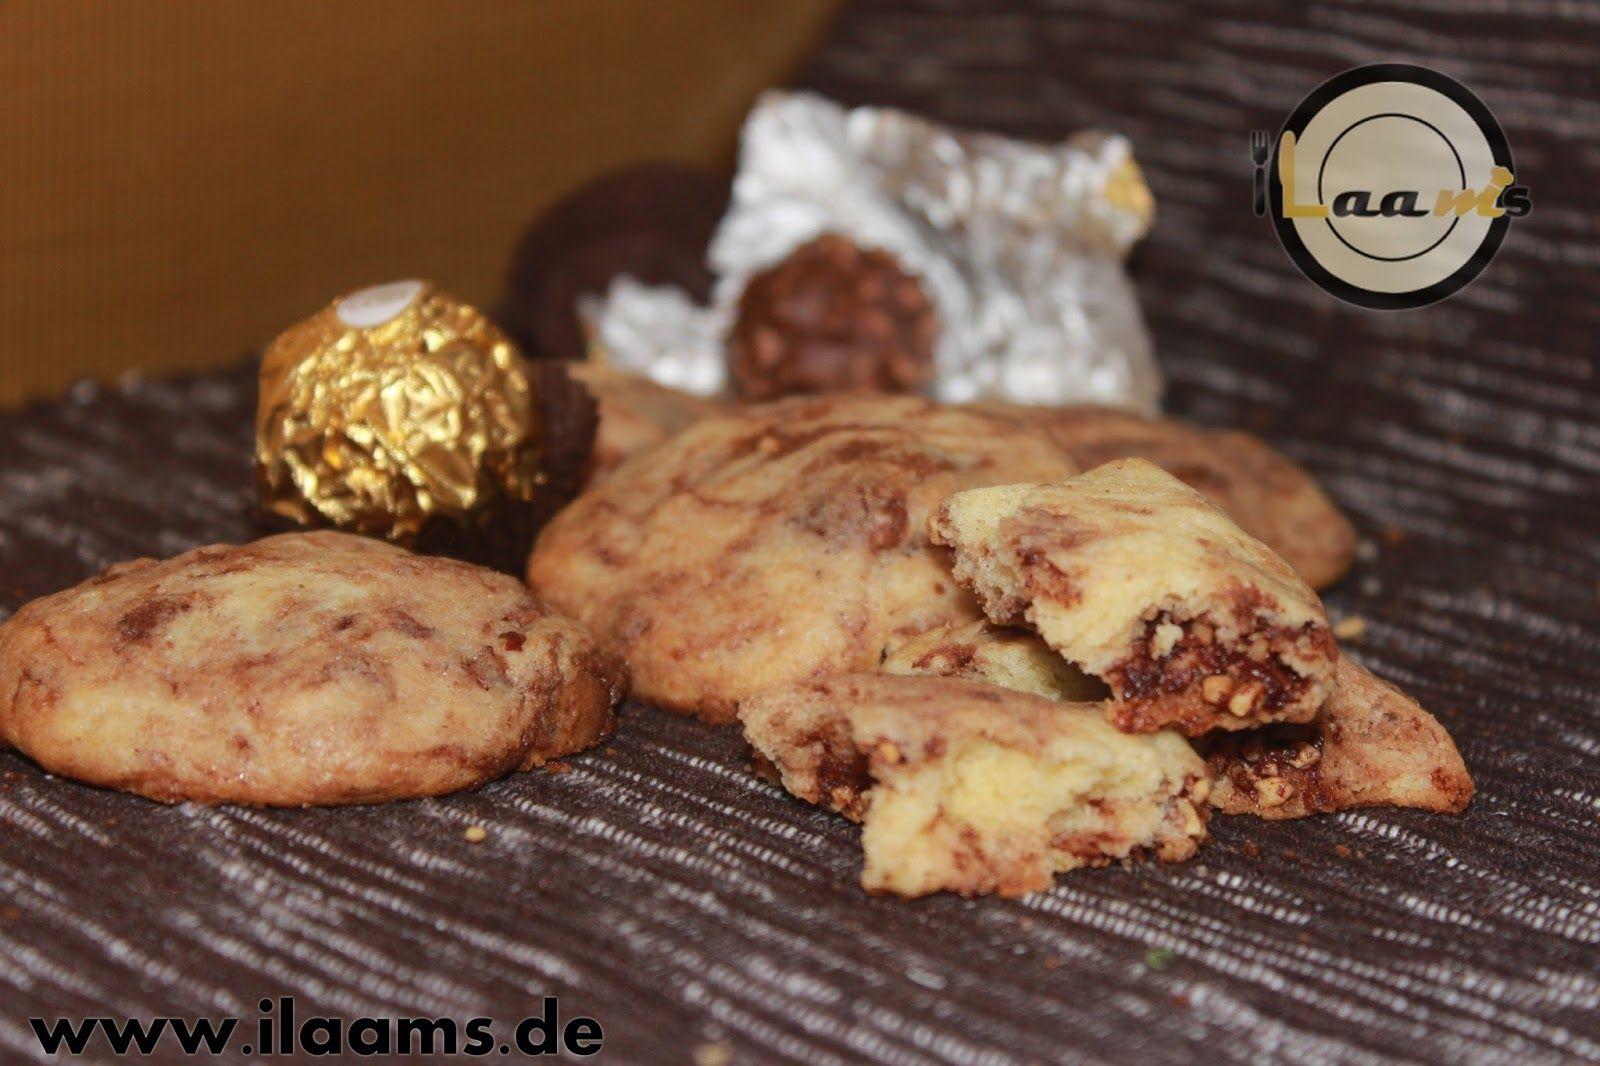 ilaams Koch und Backrezepte. Schritt für Schritt: Ferrero Rocher ® Kekse